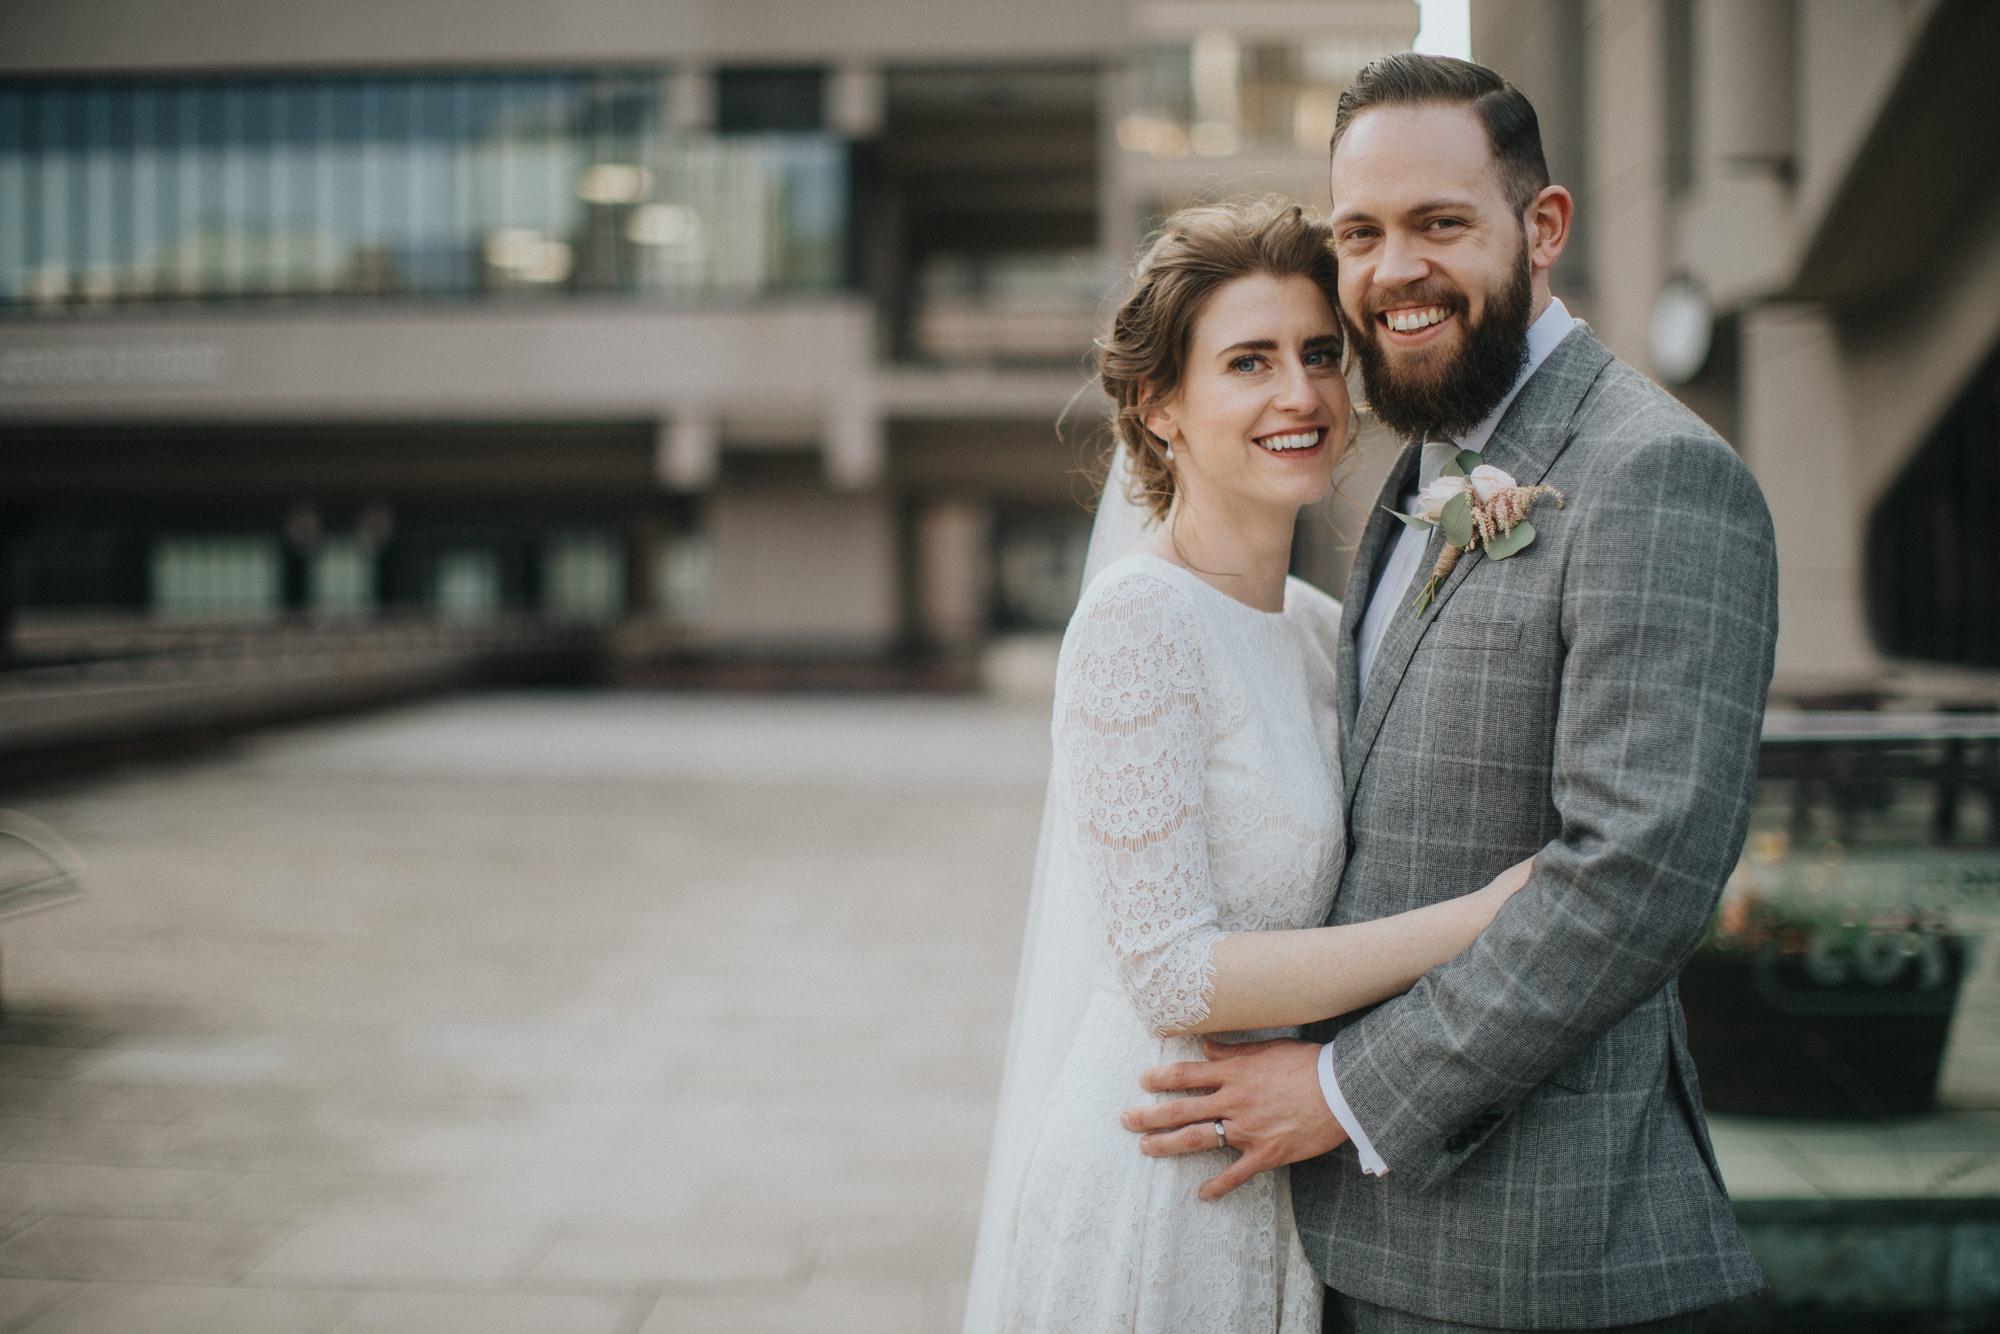 Kate-Beaumont-Lace-Flared-Dahlia-Gown-Leeds-Wedding-Bloom-Weddings-57.jpg